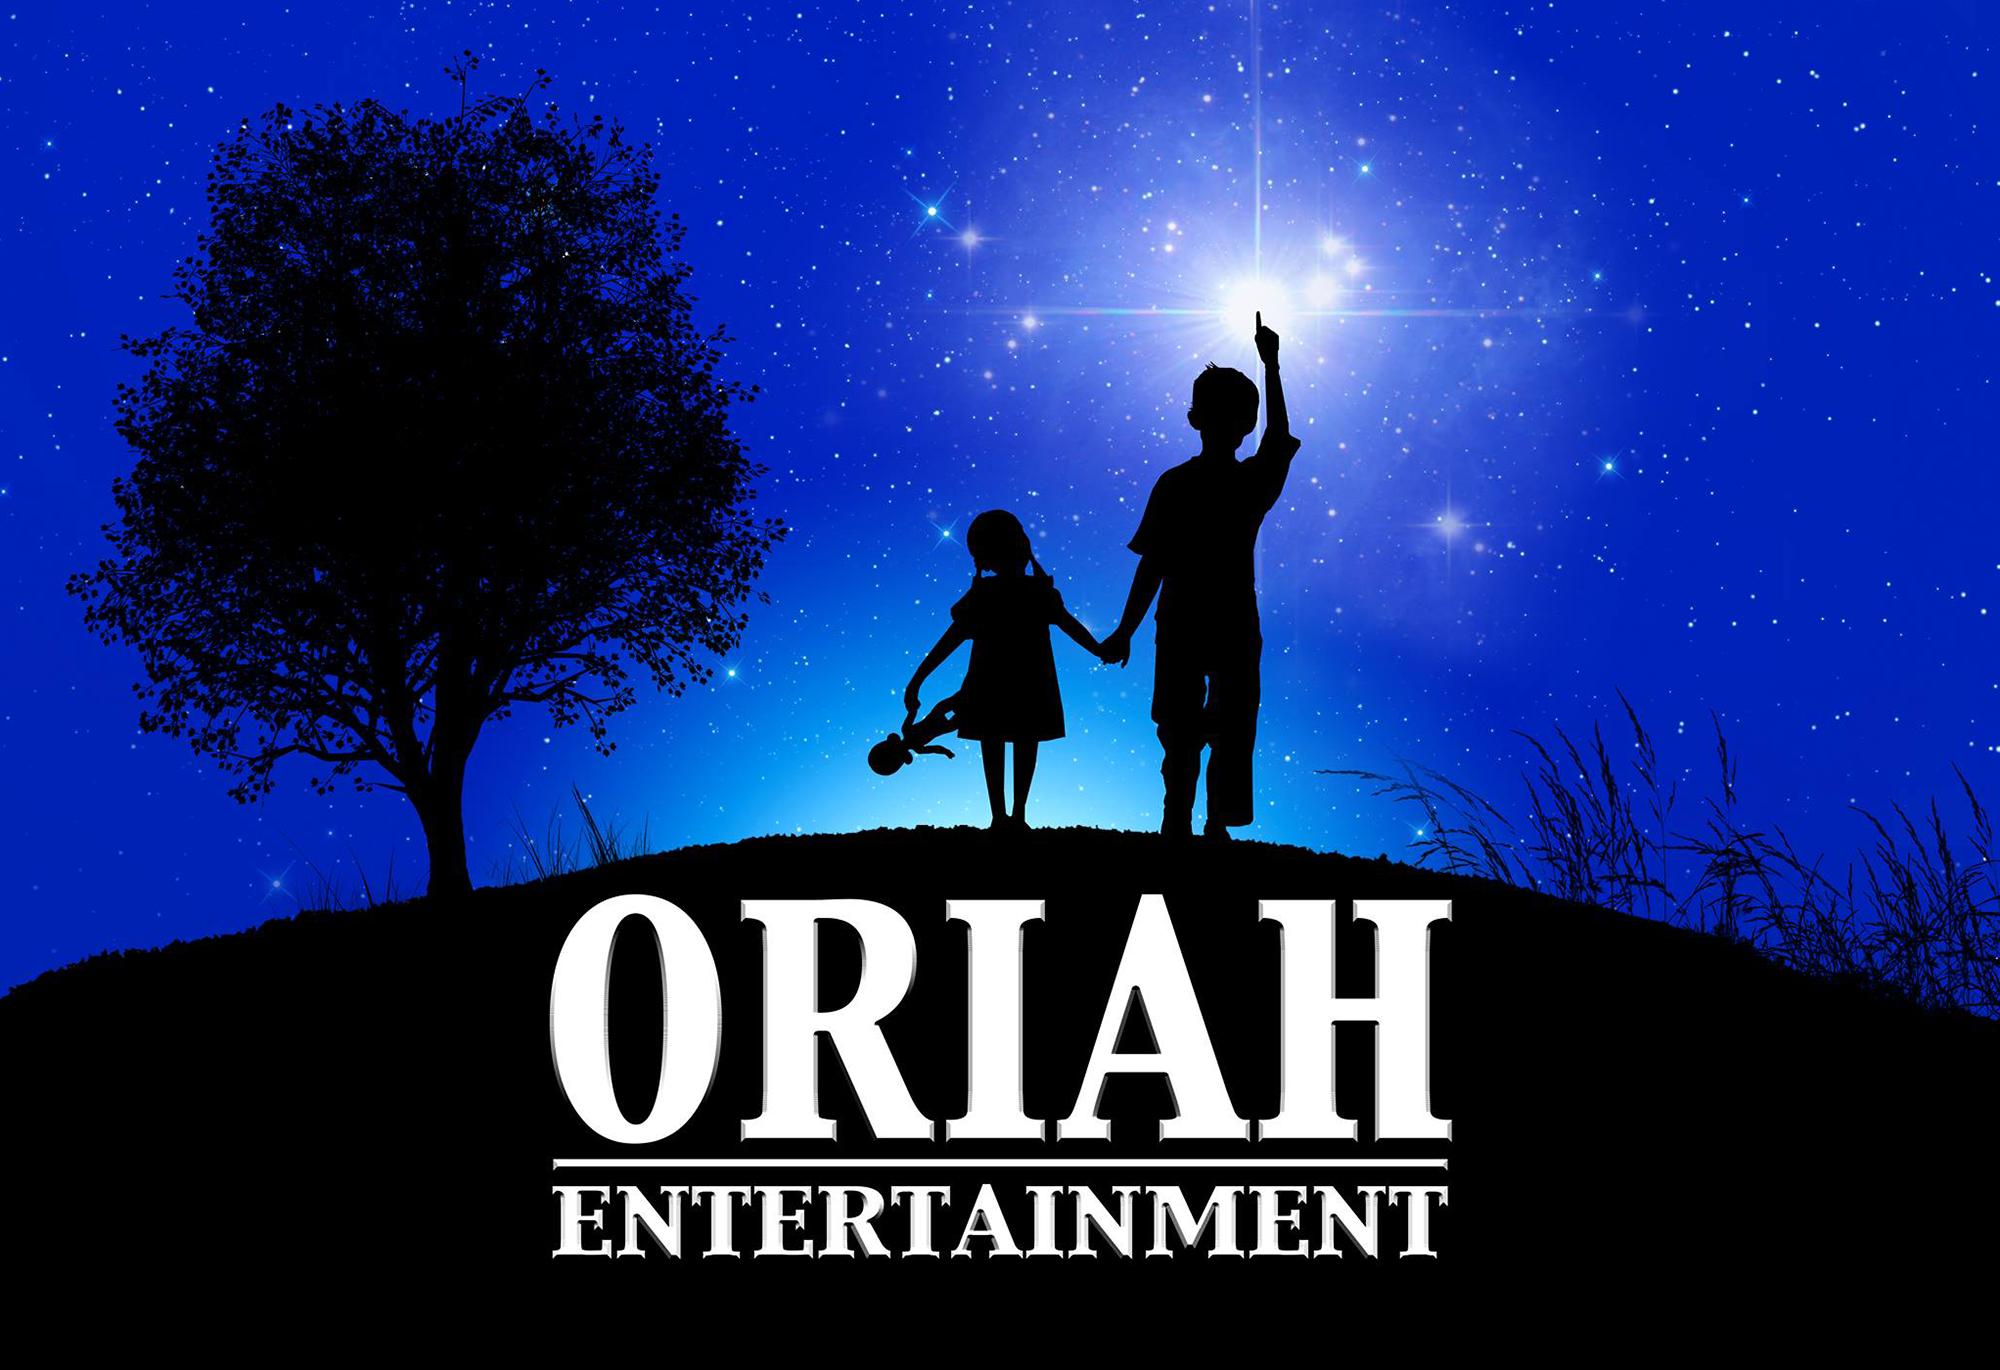 Oriah Entertainment